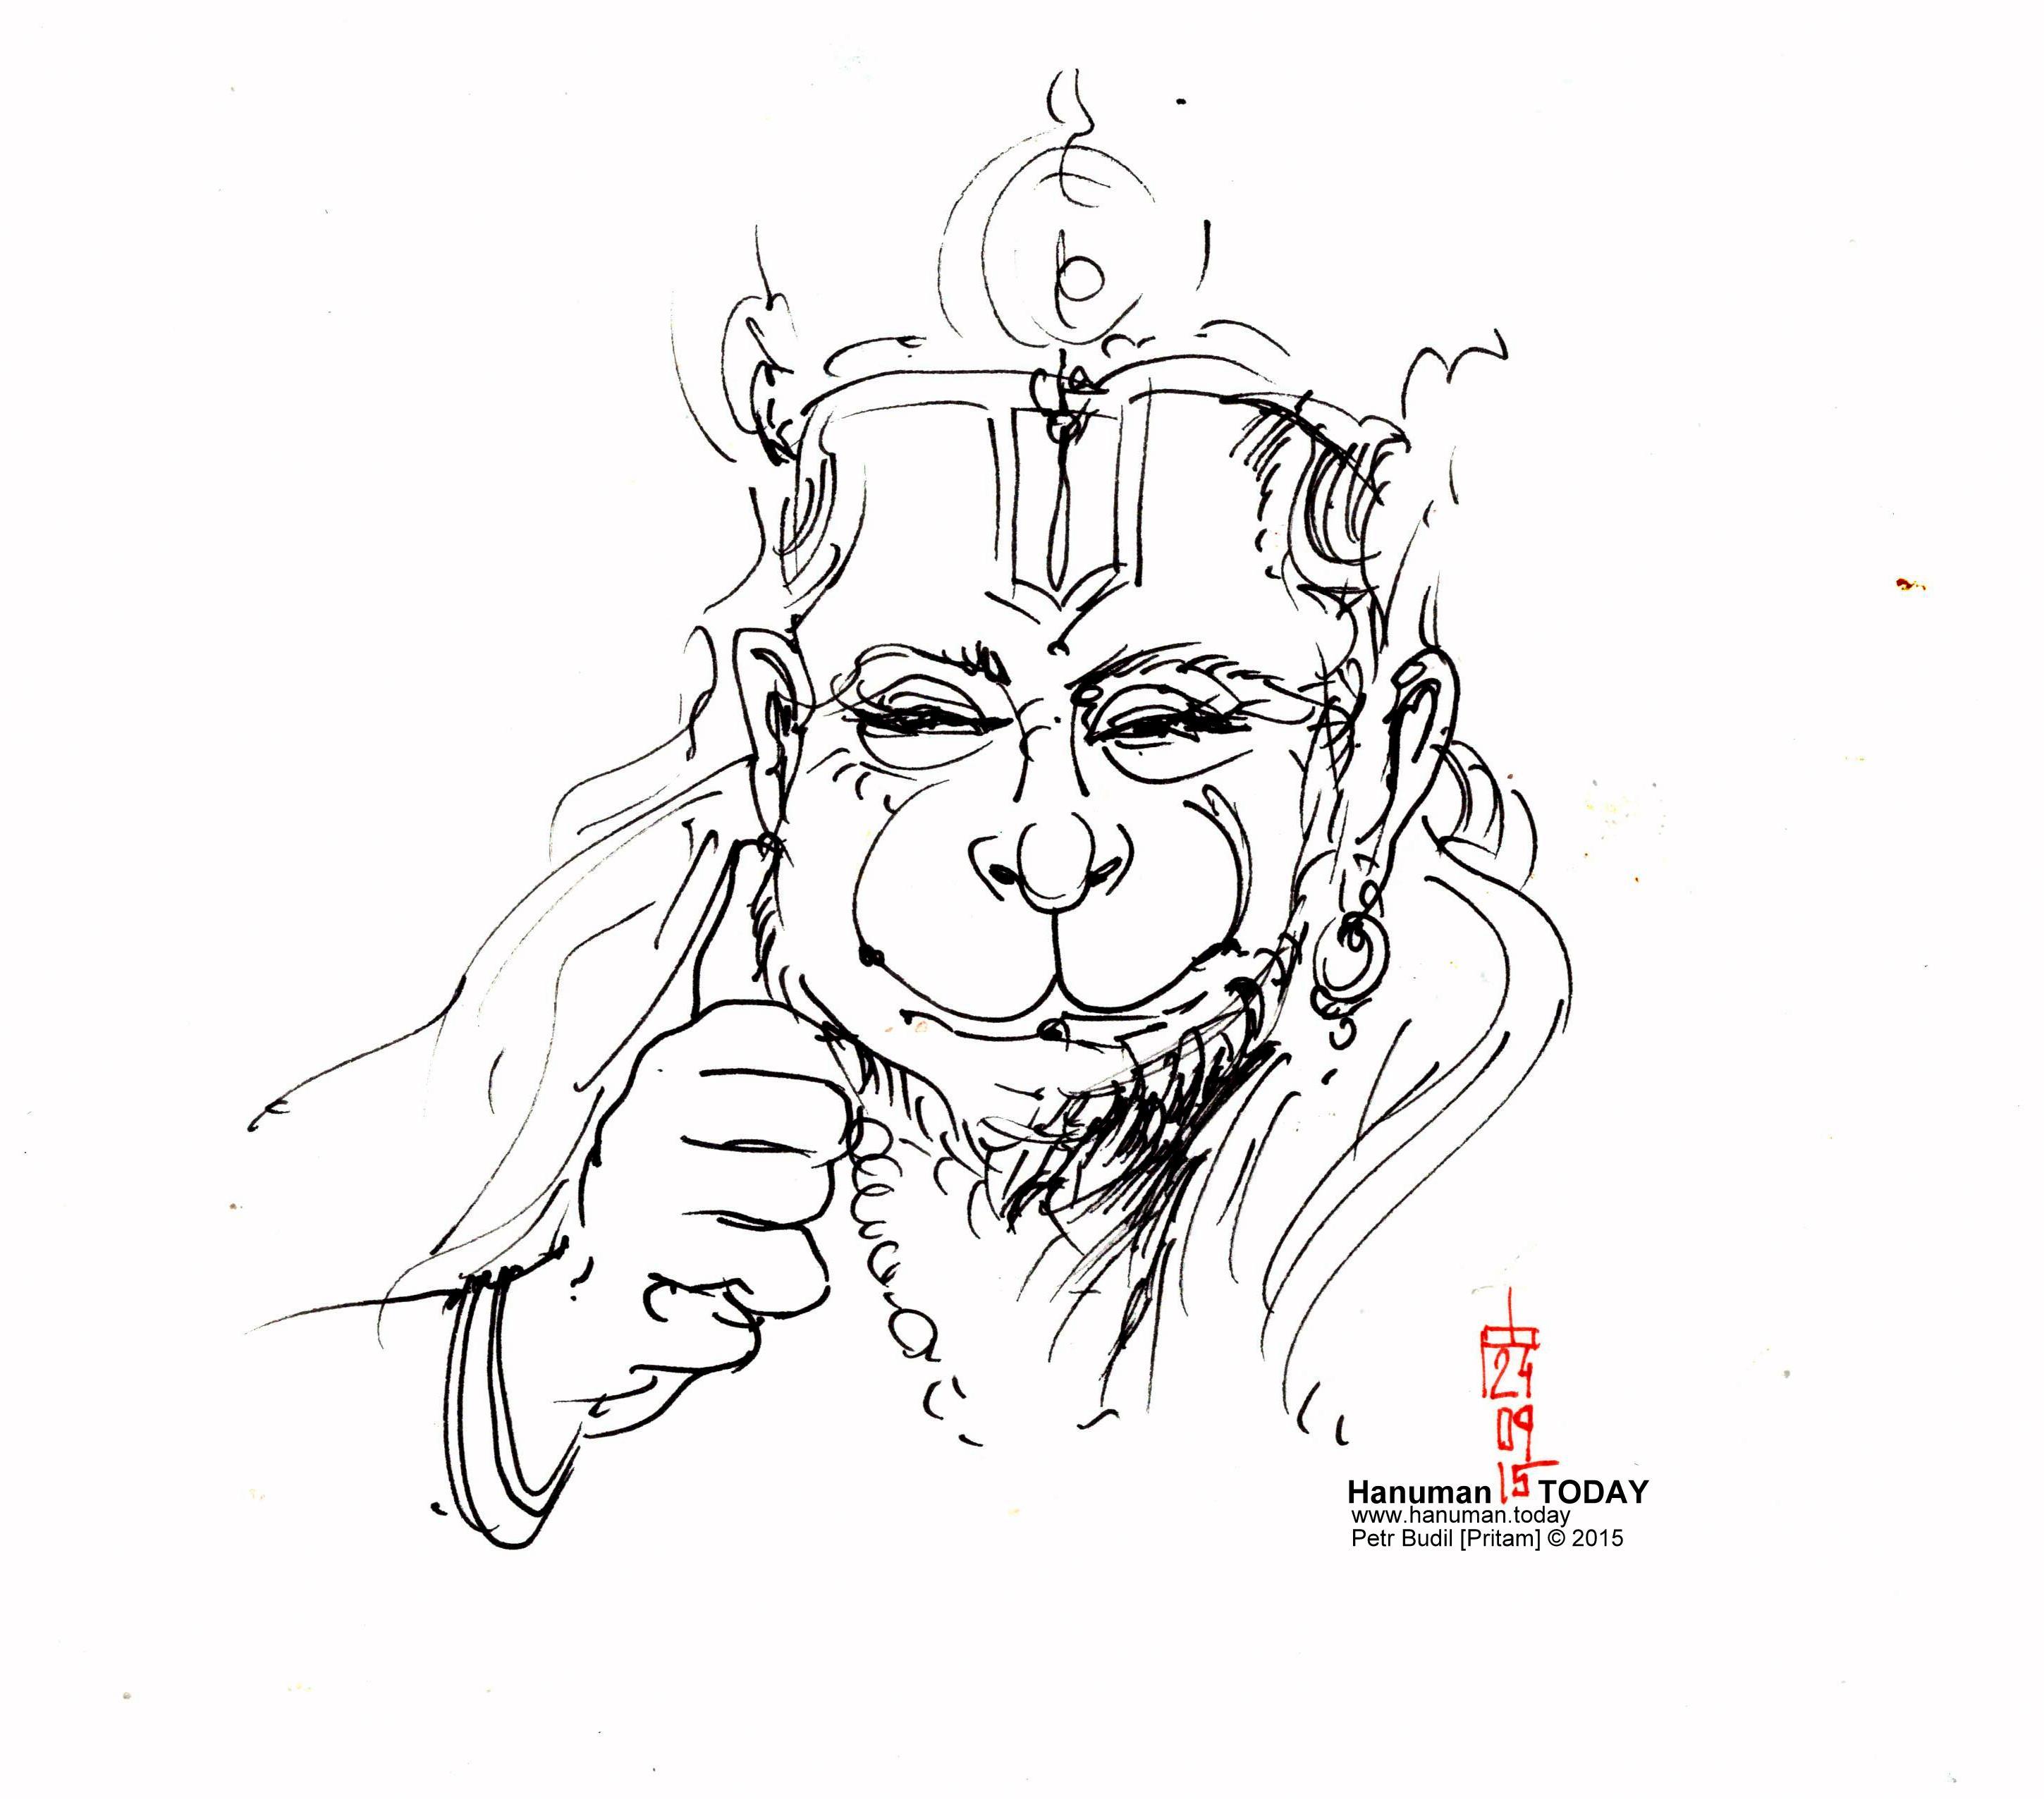 2899x2552 Thursday, September 24, 2015 Hanuman Today